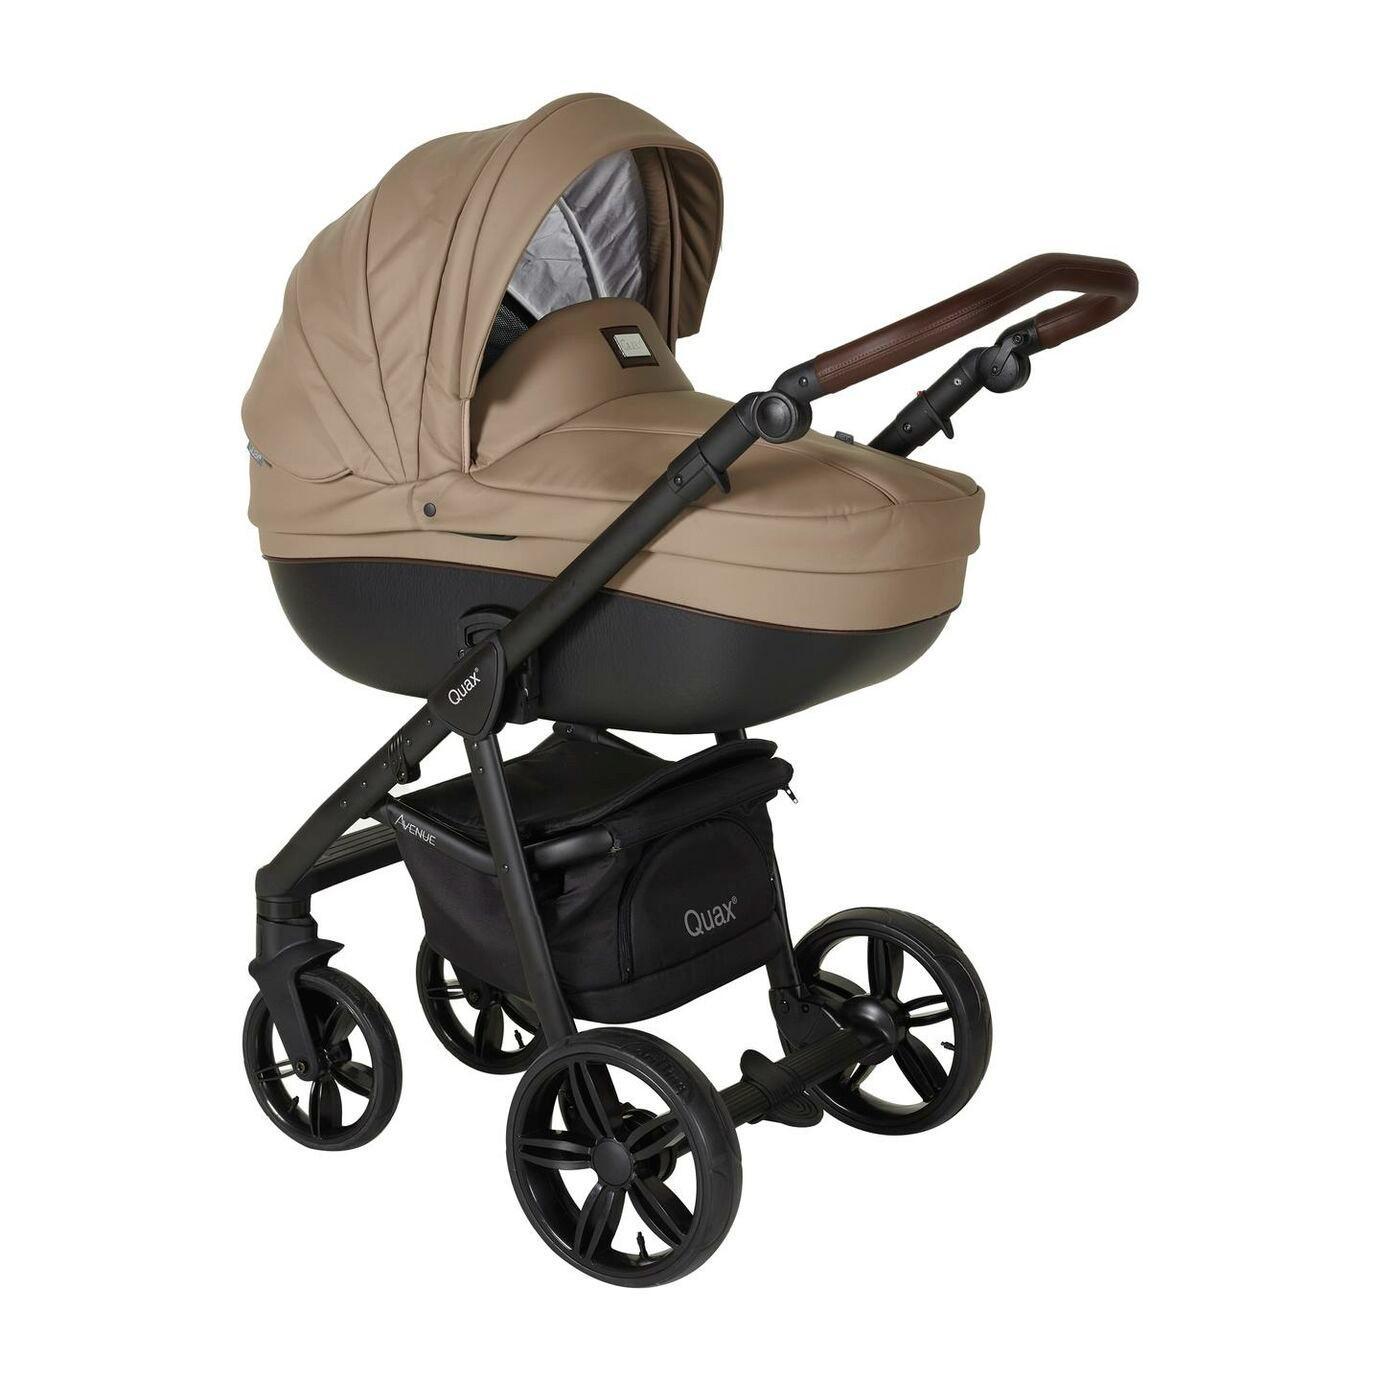 Quax - Avenue Kinderwagen - Eco Stone